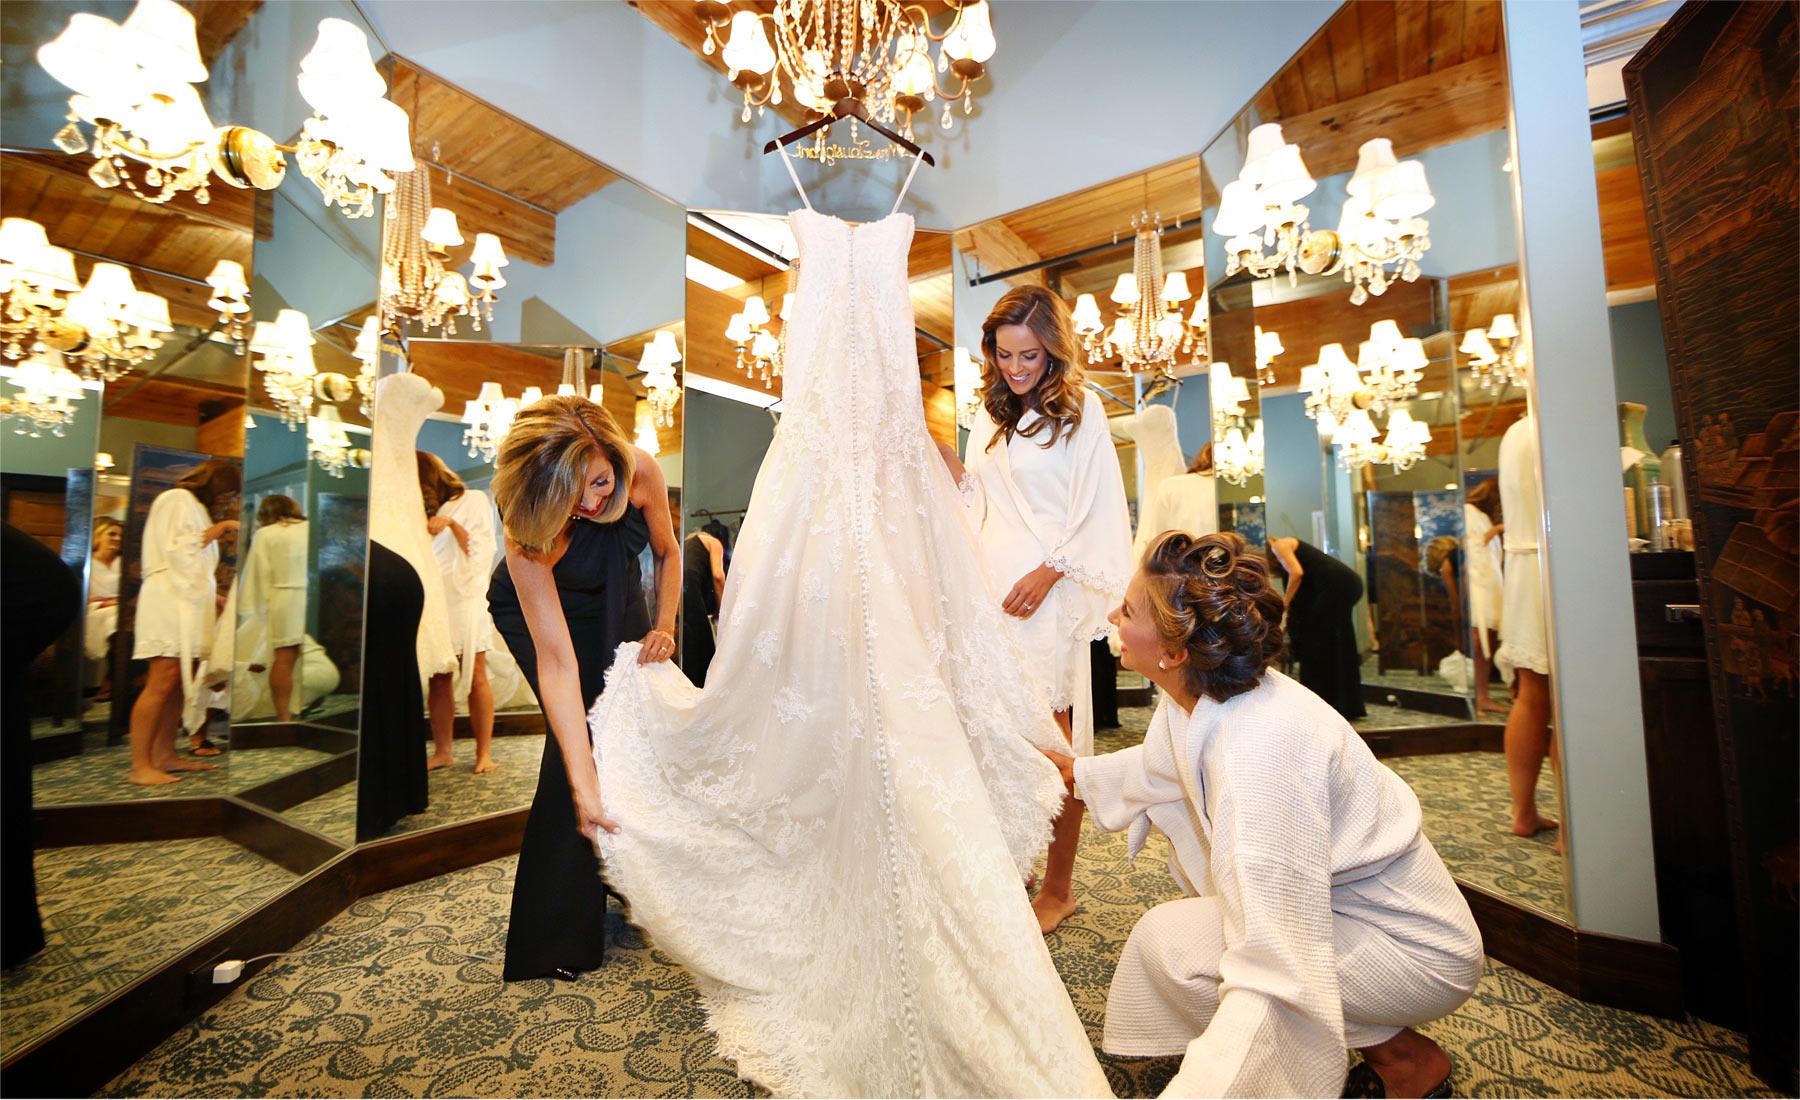 01-Saint-Paul-Minnesota-Wedding-Photographer-by-Andrew-Vick-Photography-Summer-Abulae-Getting-Ready-Bride-Mother-Bridesmaid-Dress-Hanger-Molly-and-Dan.jpg